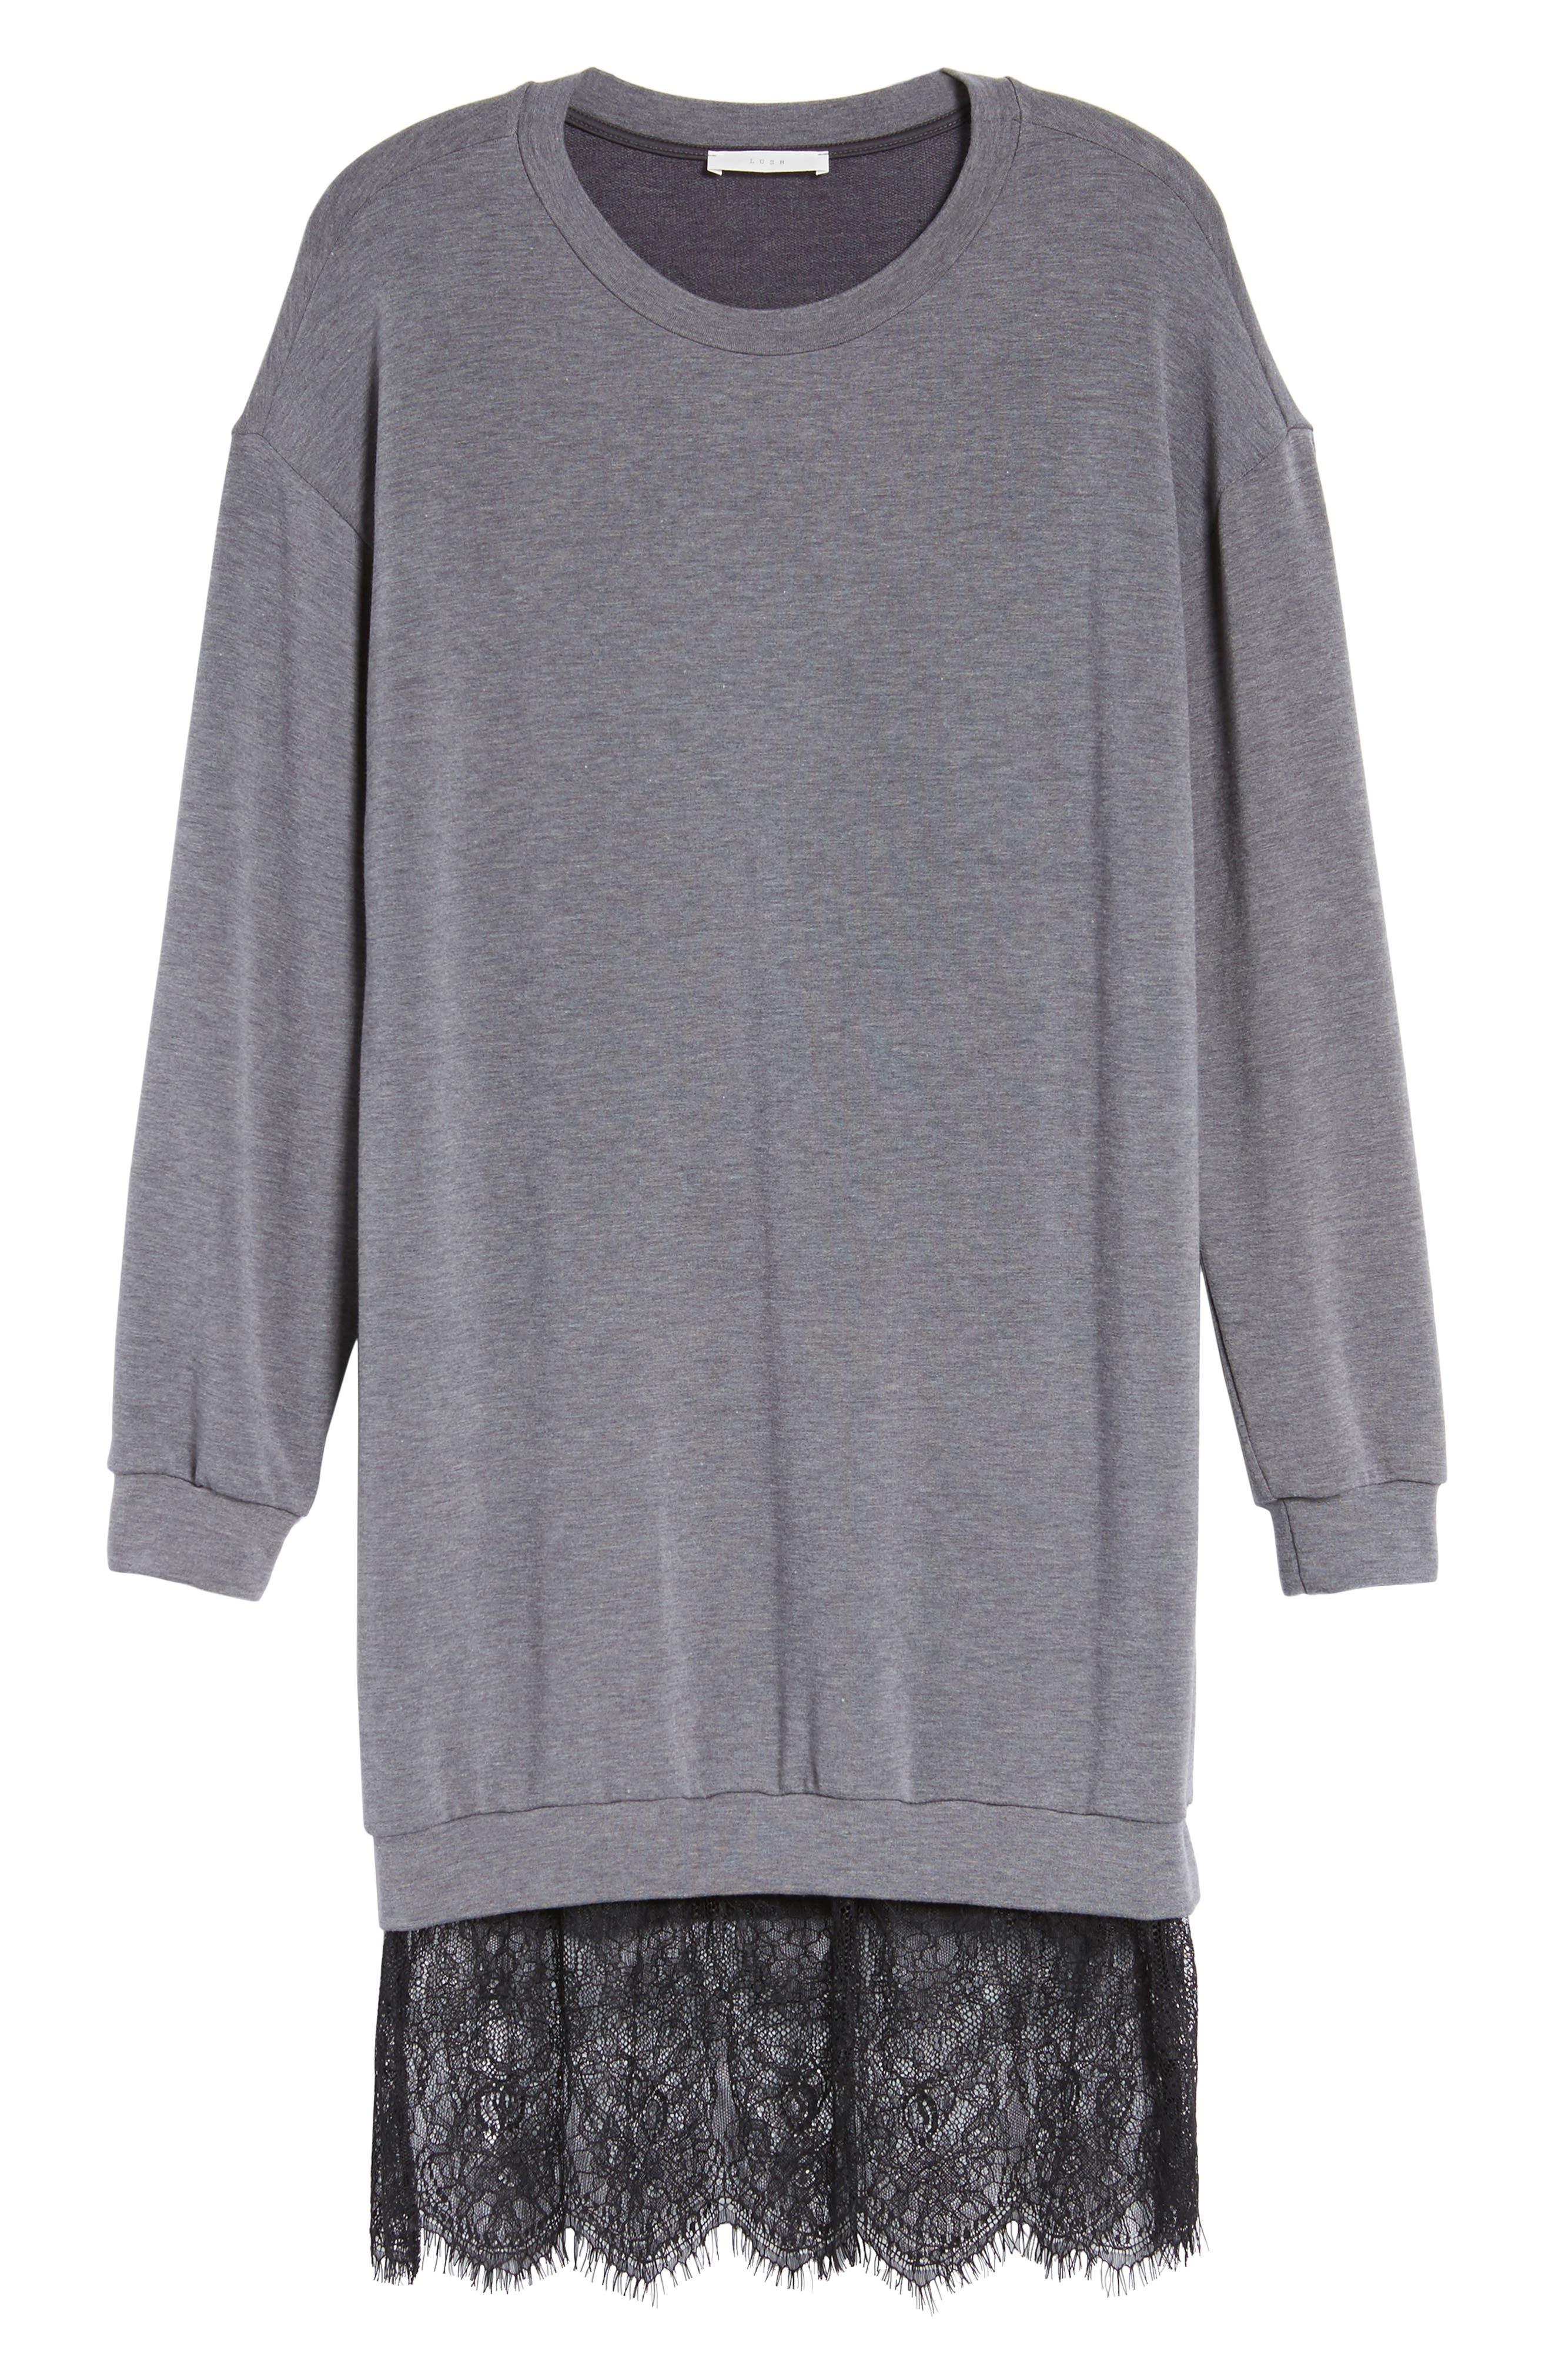 Lace Hem Sweatshirt Dress,                             Alternate thumbnail 6, color,                             002